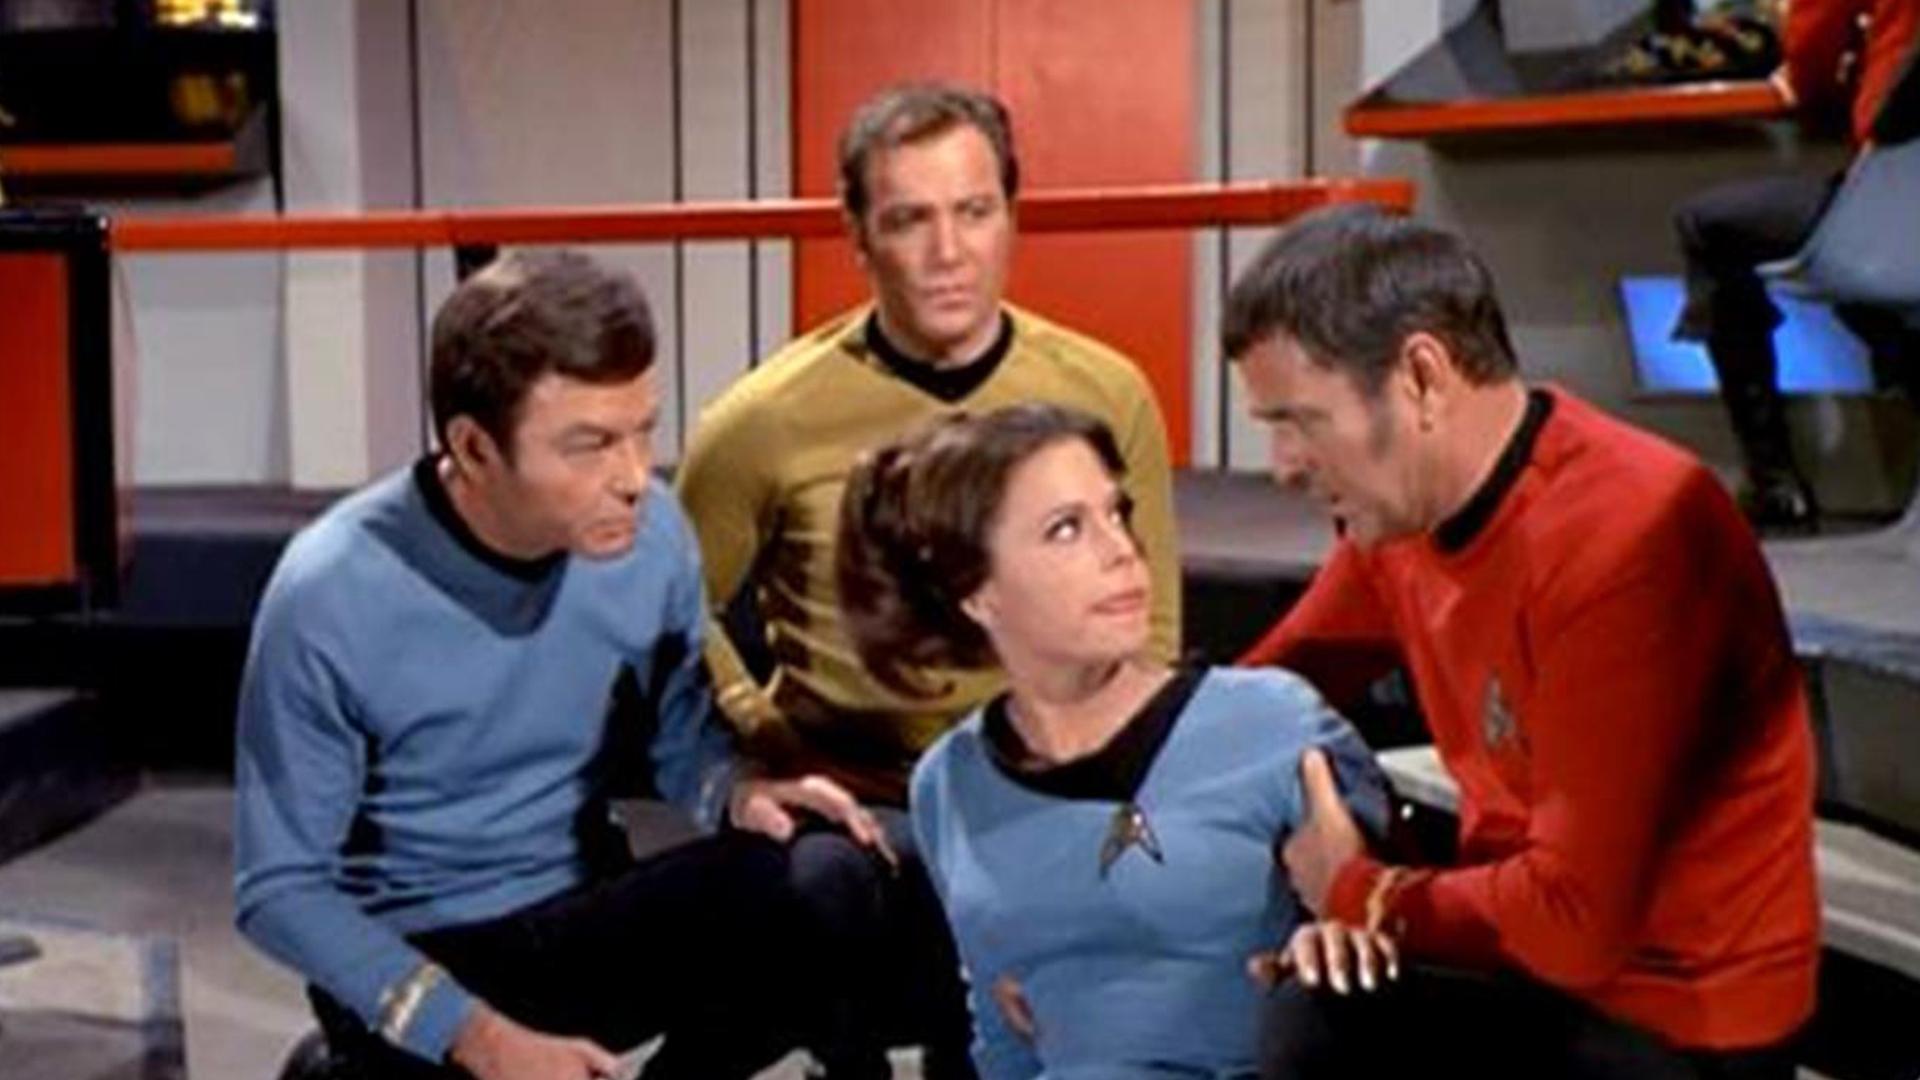 Watch Star Trek: The Original Series (Remastered) Season 3 Episode 18: The  Lights of Zetar - Full show on CBS All Access